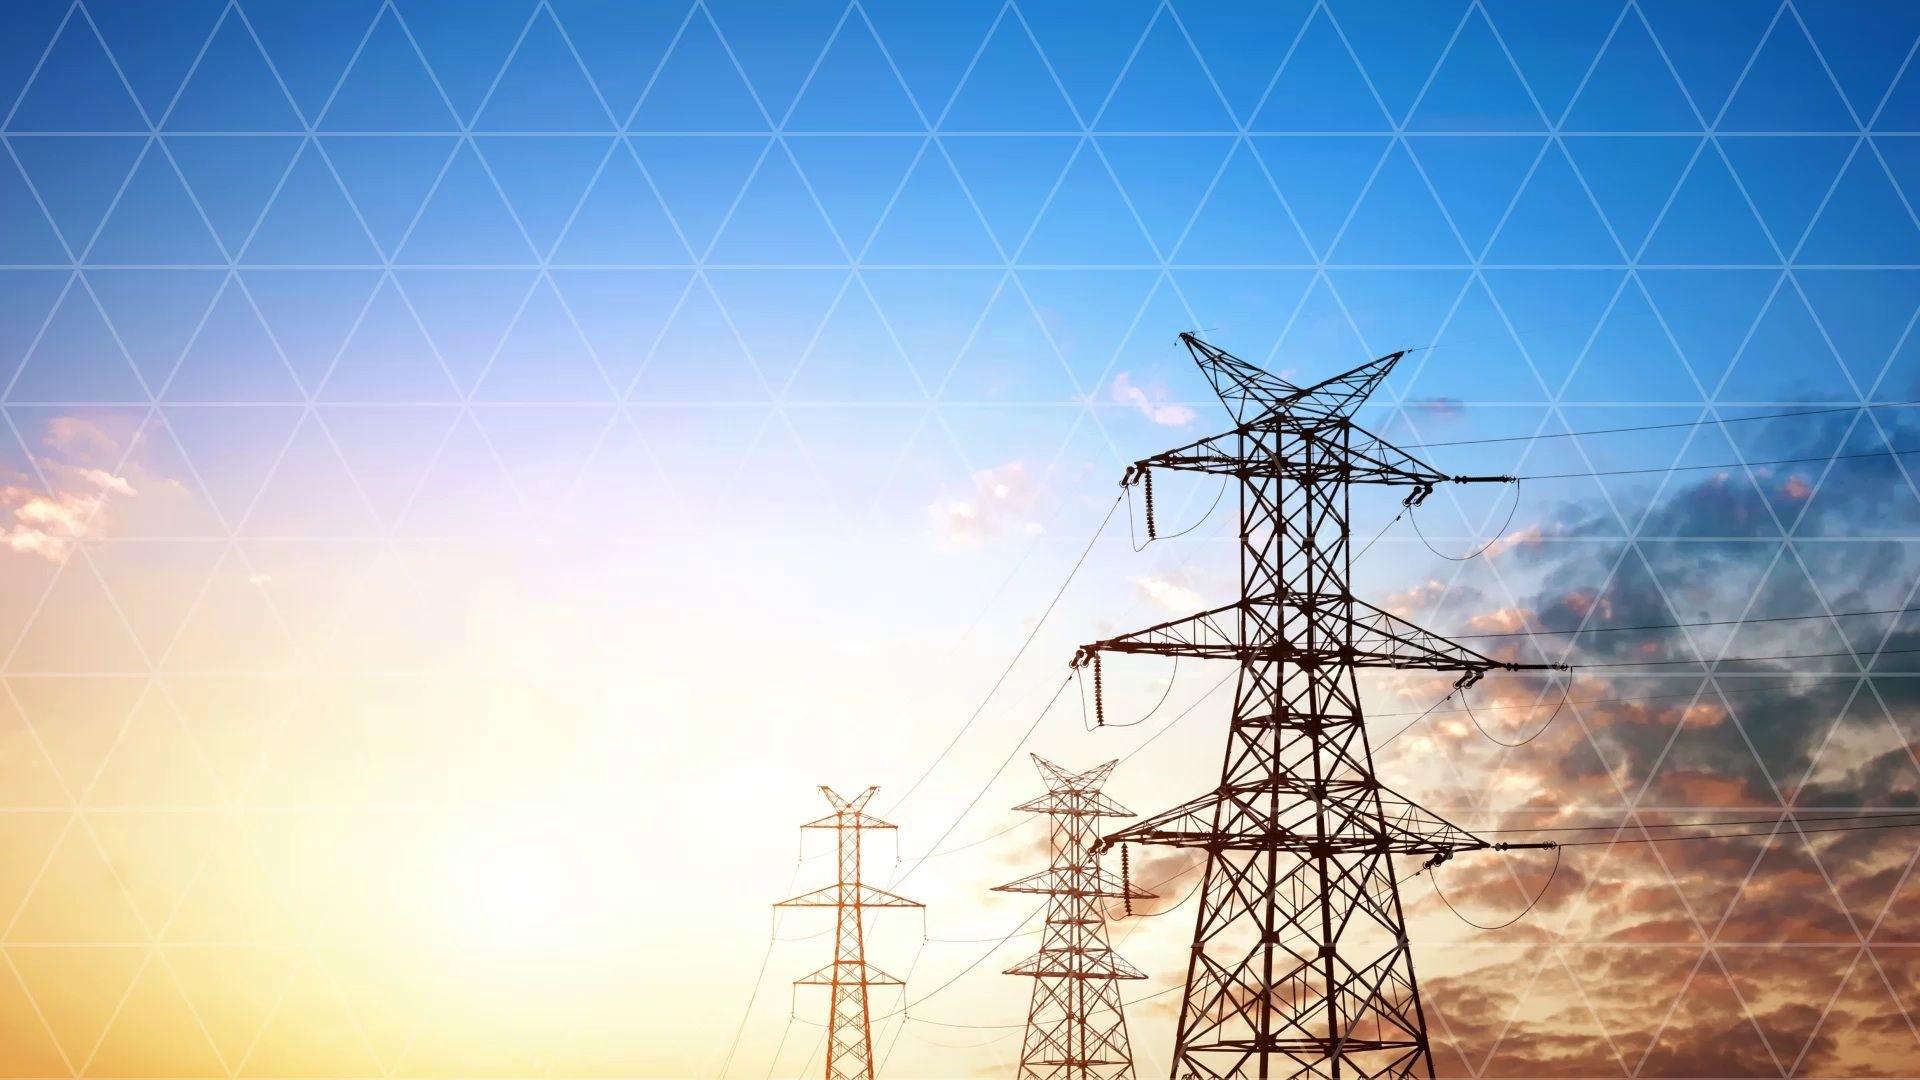 Electric hd wallpaper download